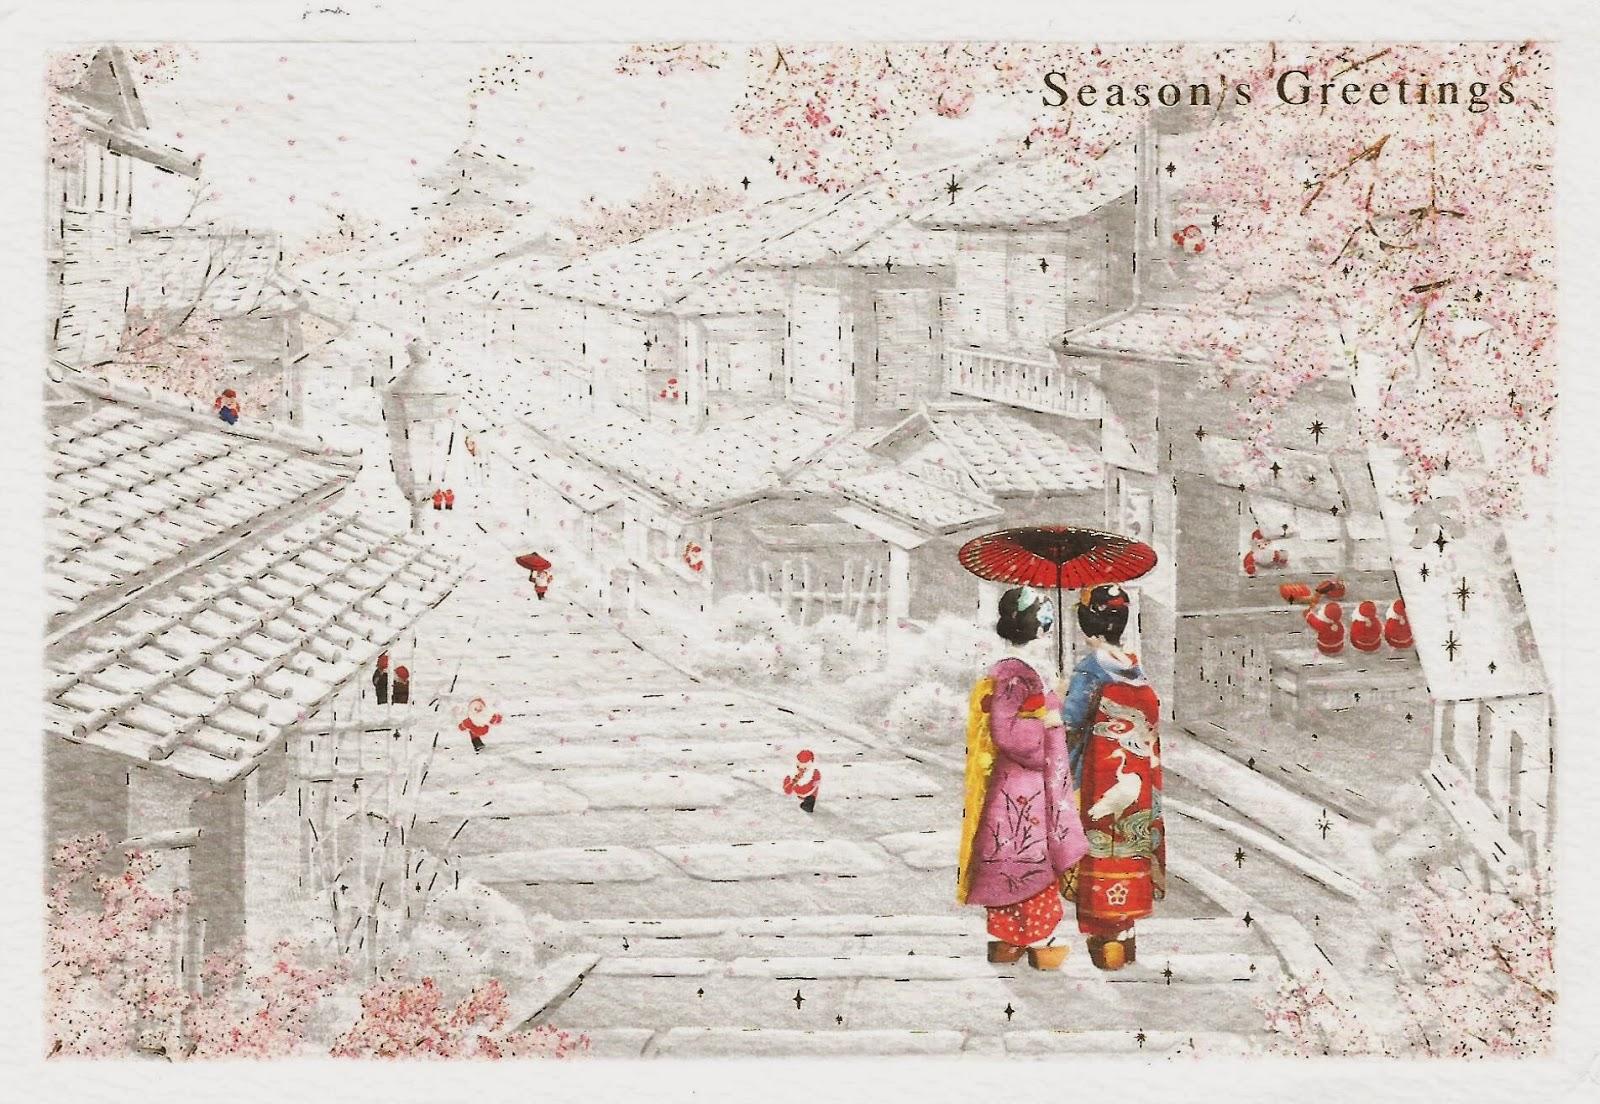 Postcards on my wall seasons greetings japan seasons greetings japan m4hsunfo